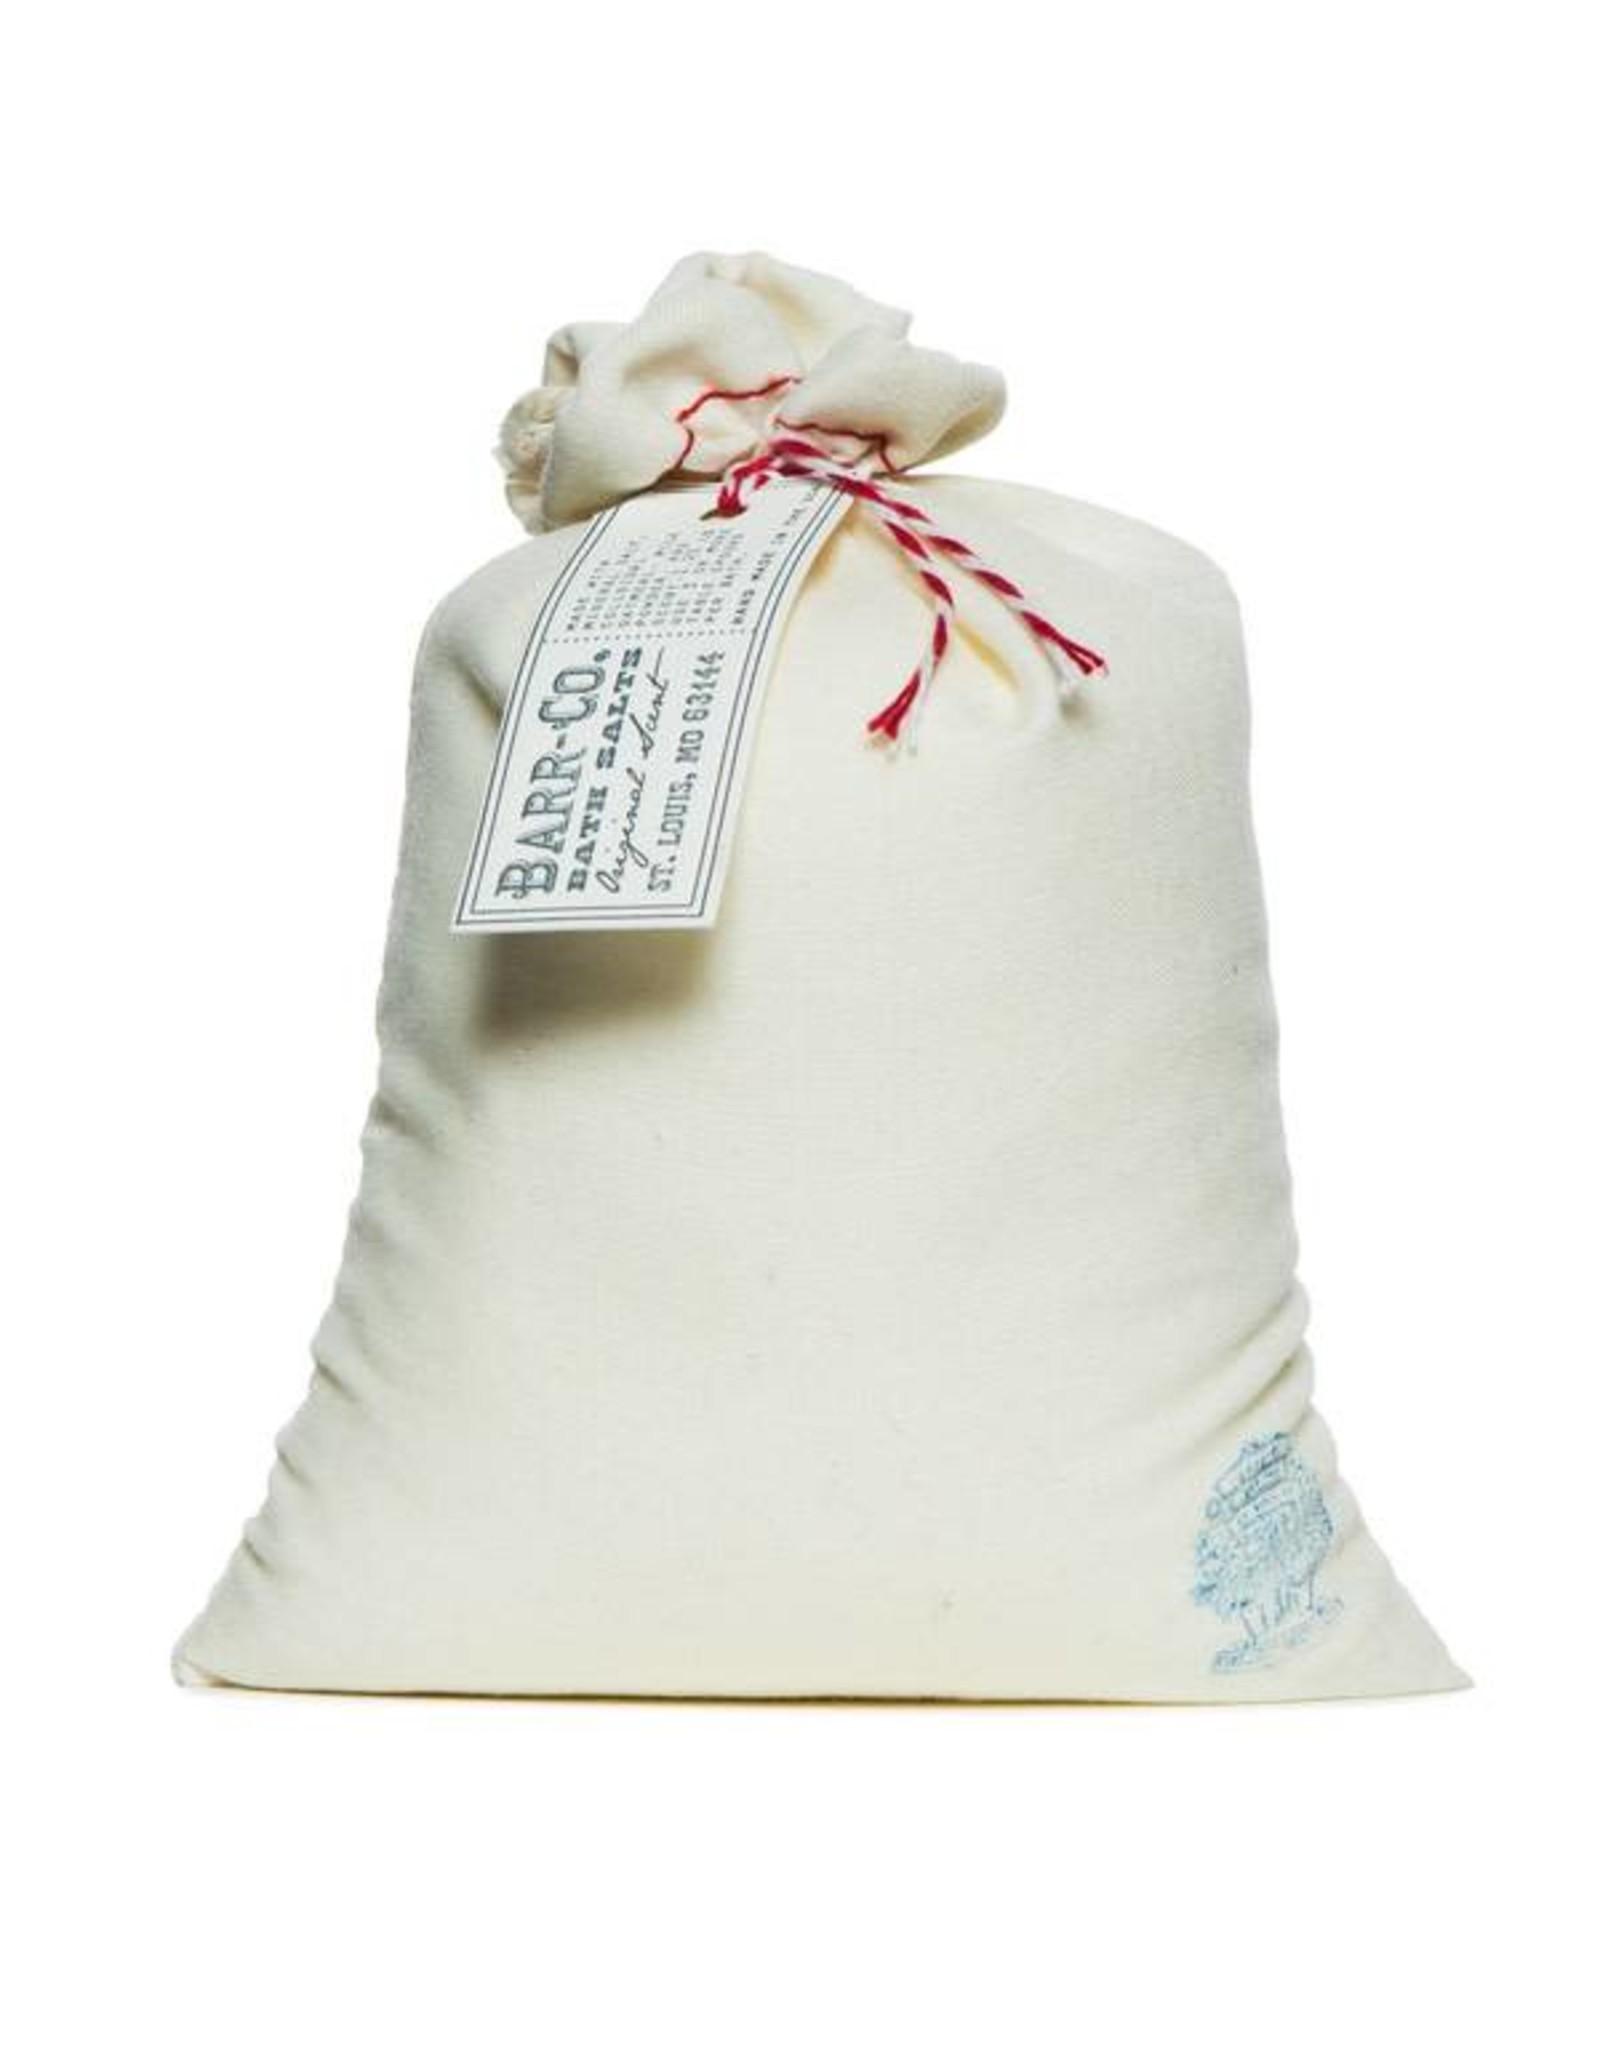 BARR CO Bath Salt Original Scent